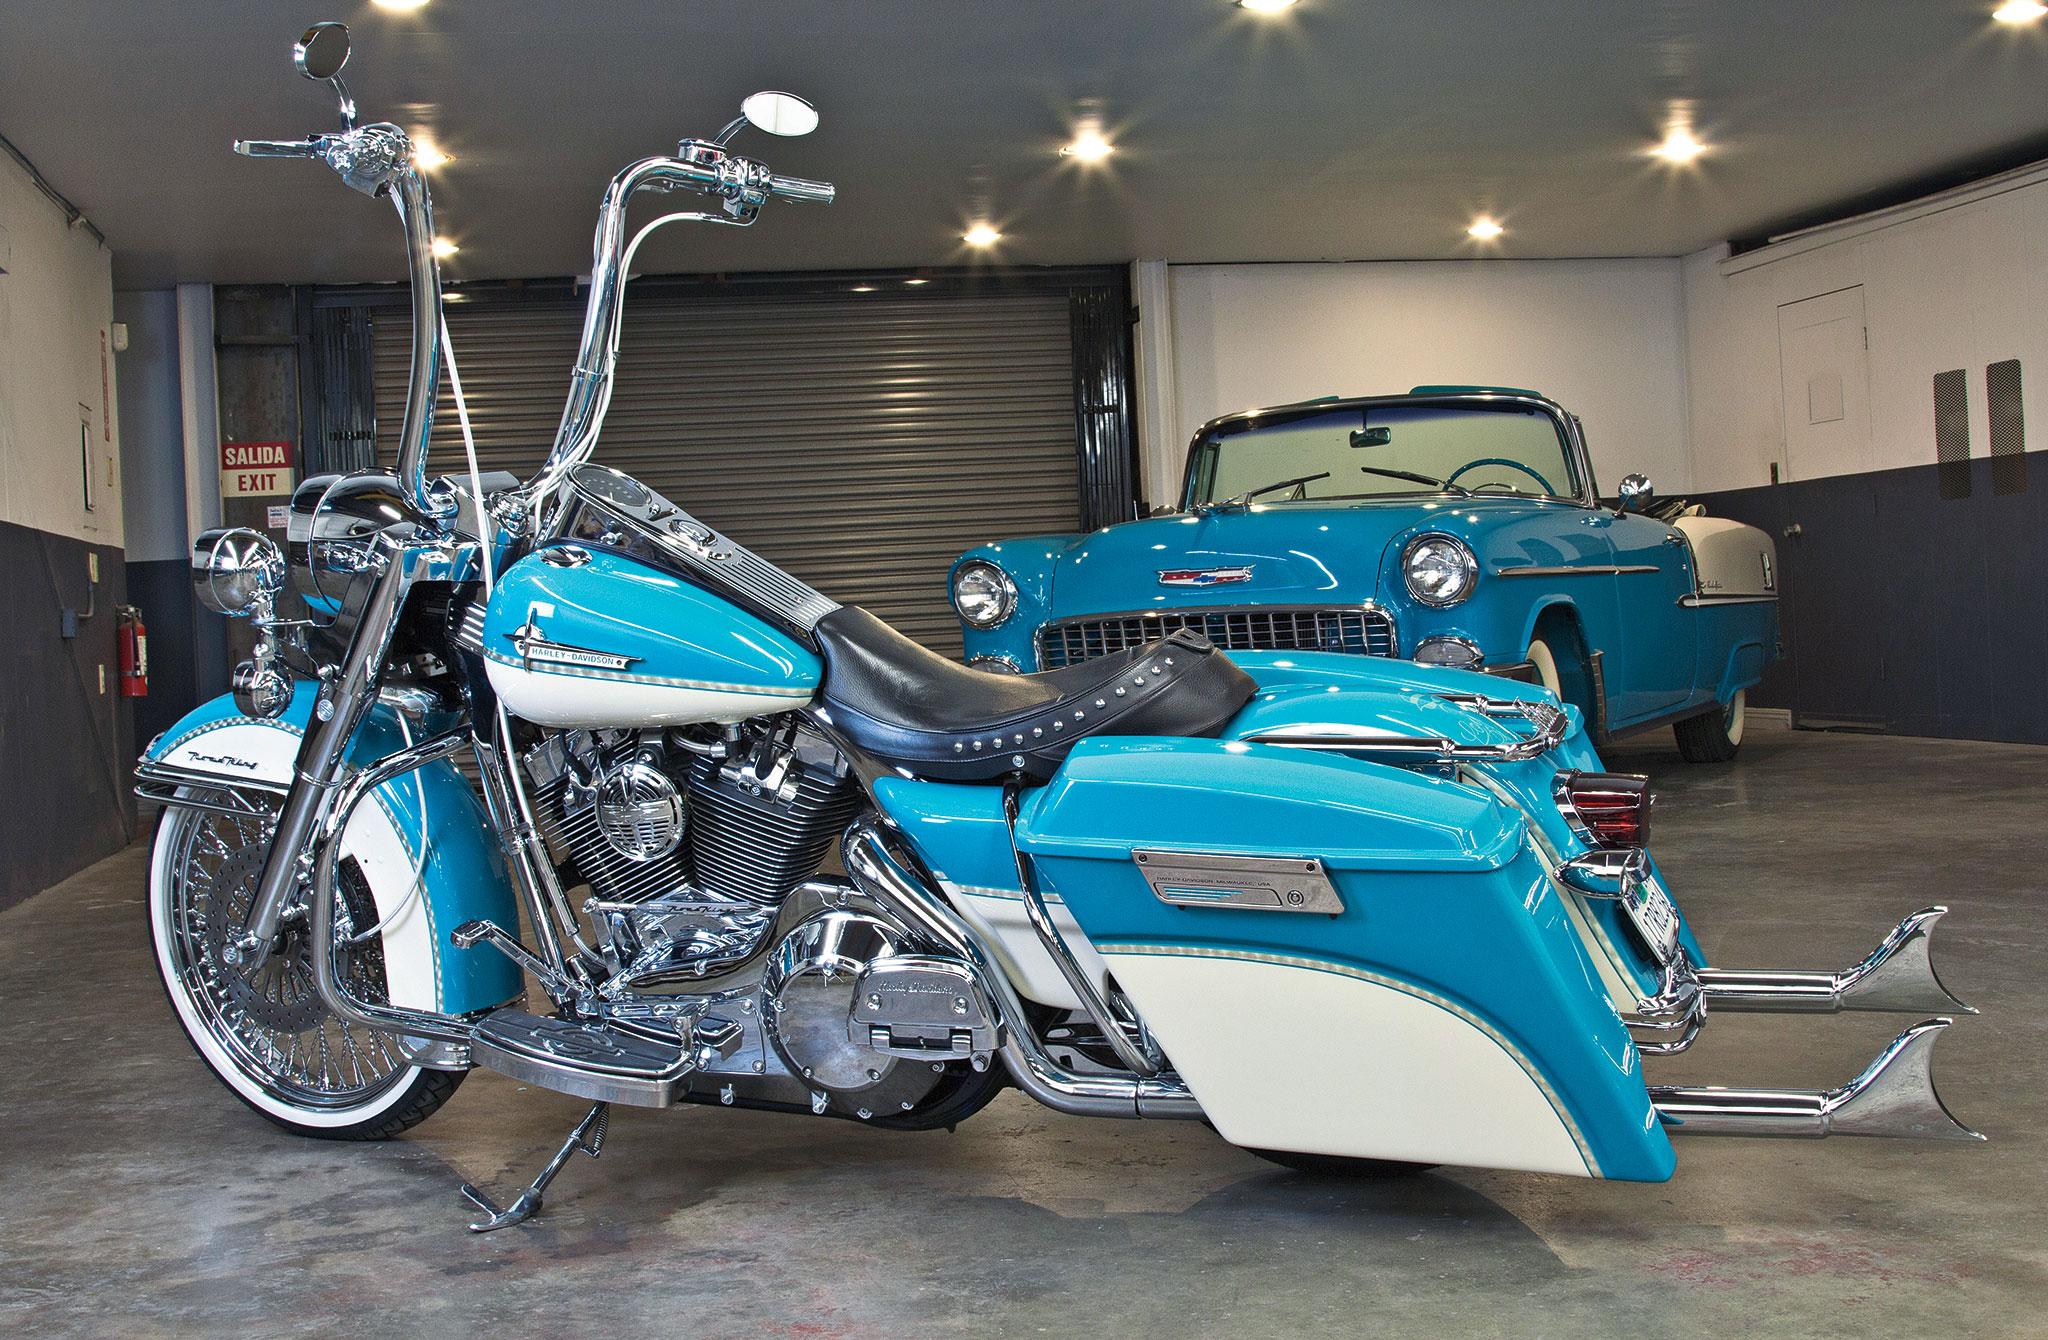 2005 Harley Davidson Road King Bel Air Bagger Lowrider